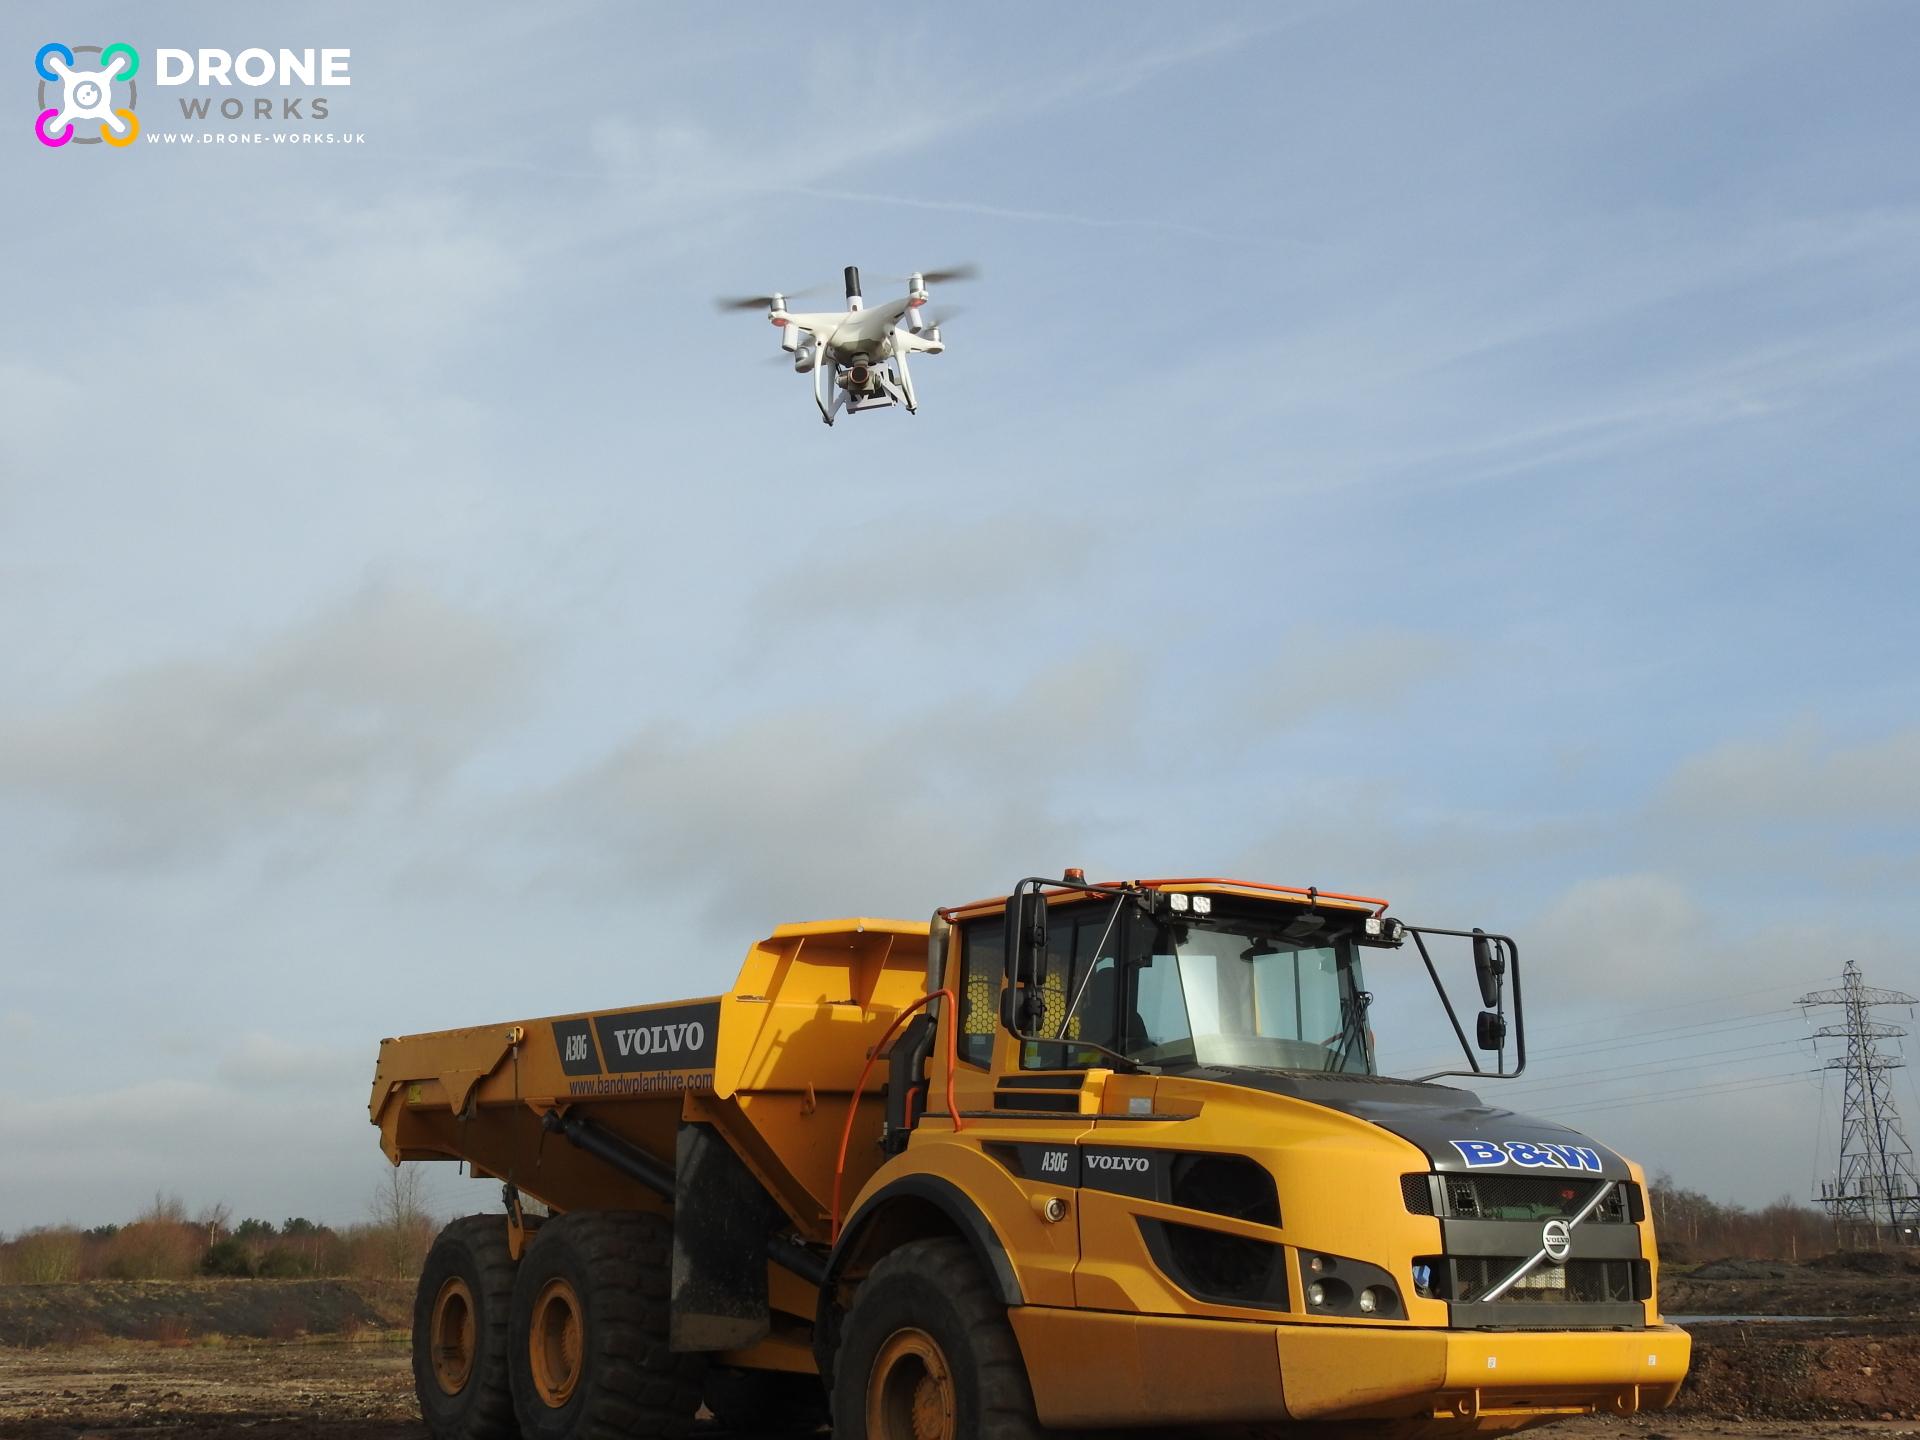 Phantom 4 PPK above a hauler on site